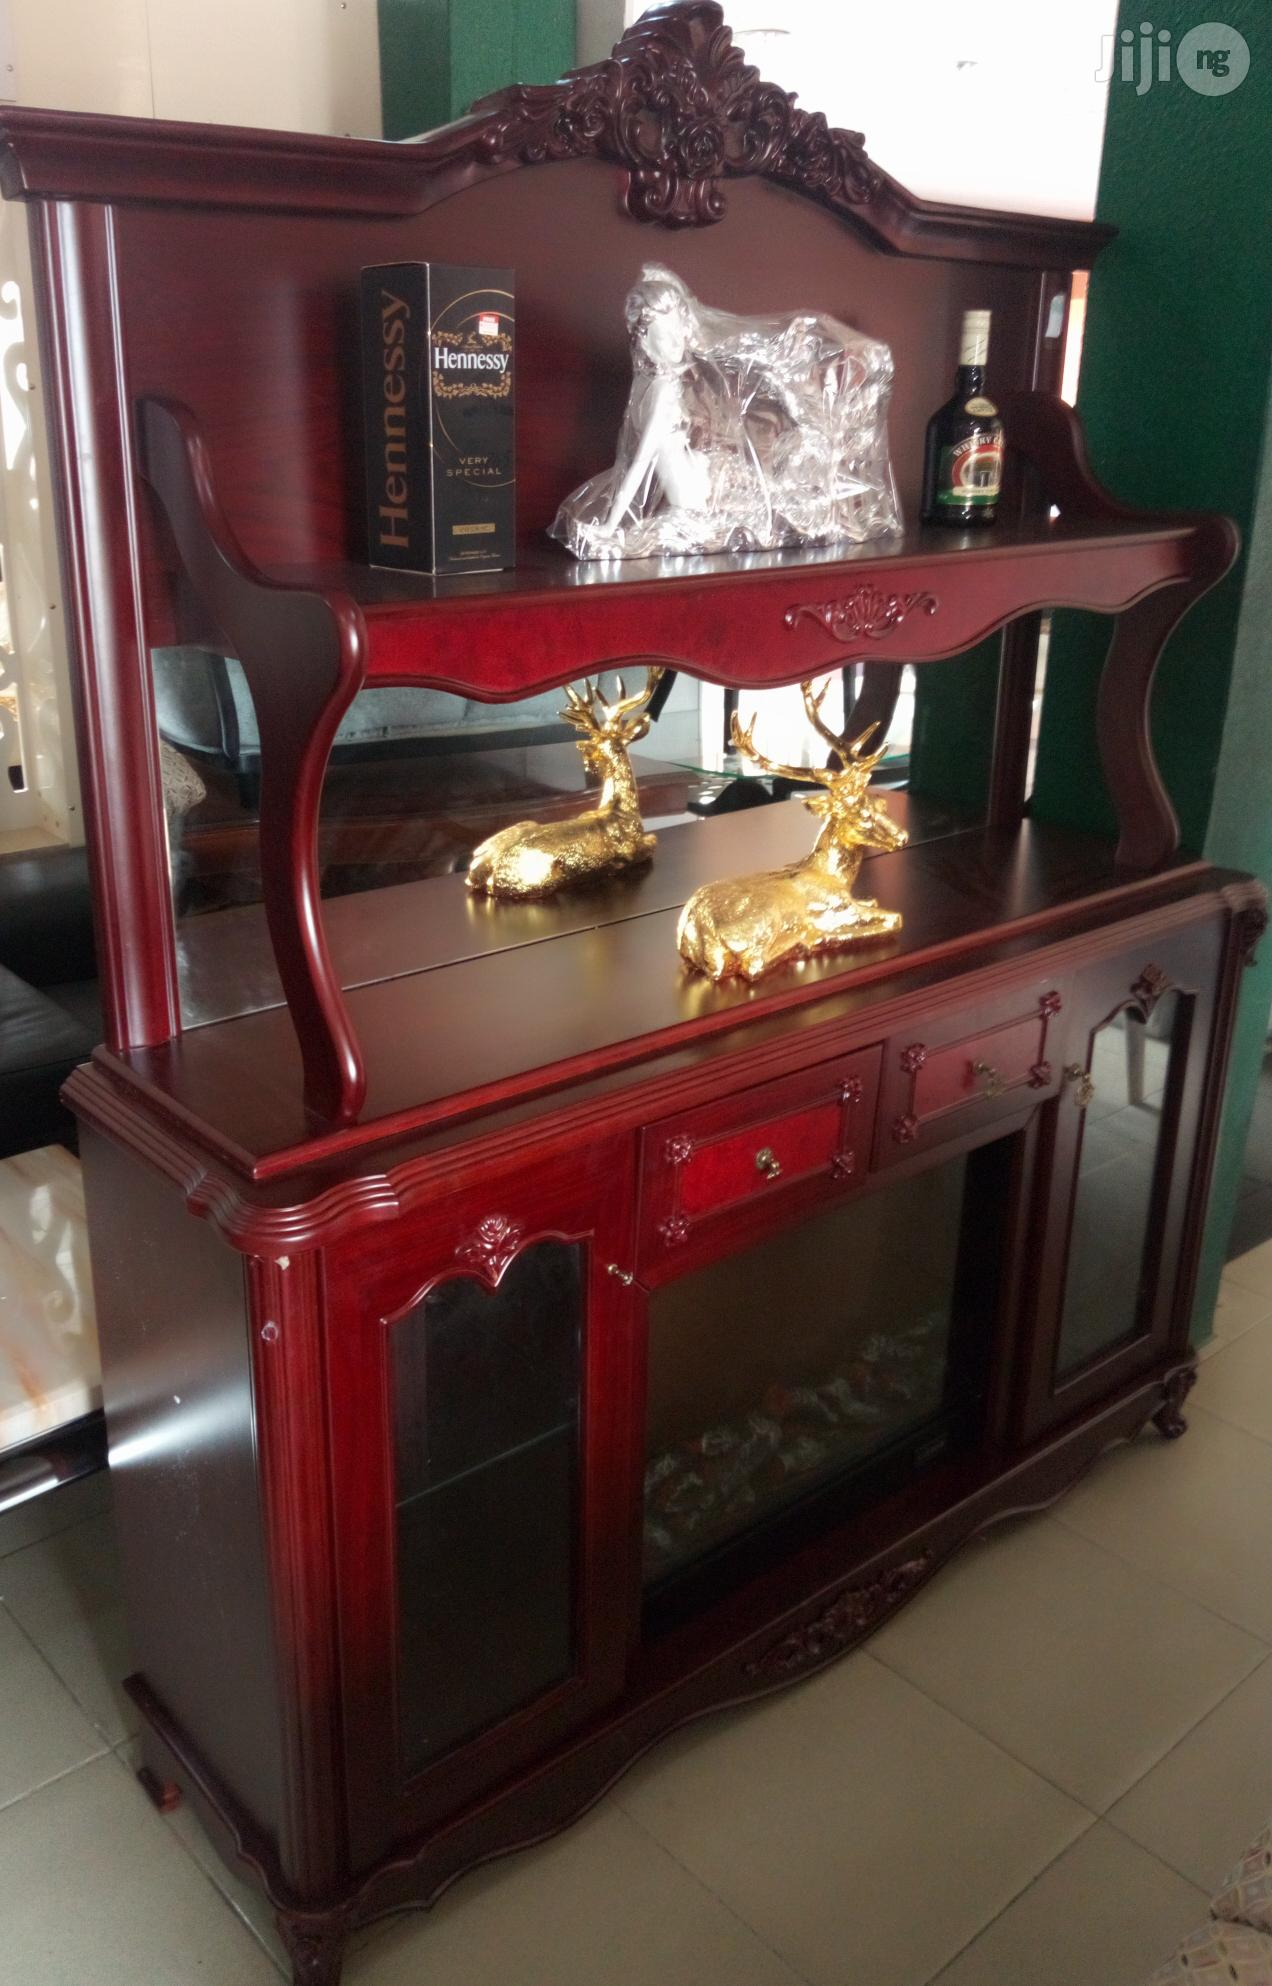 Superb Executive Royal Wine Bar Brand New   Furniture for sale in Lekki, Lagos State, Nigeria